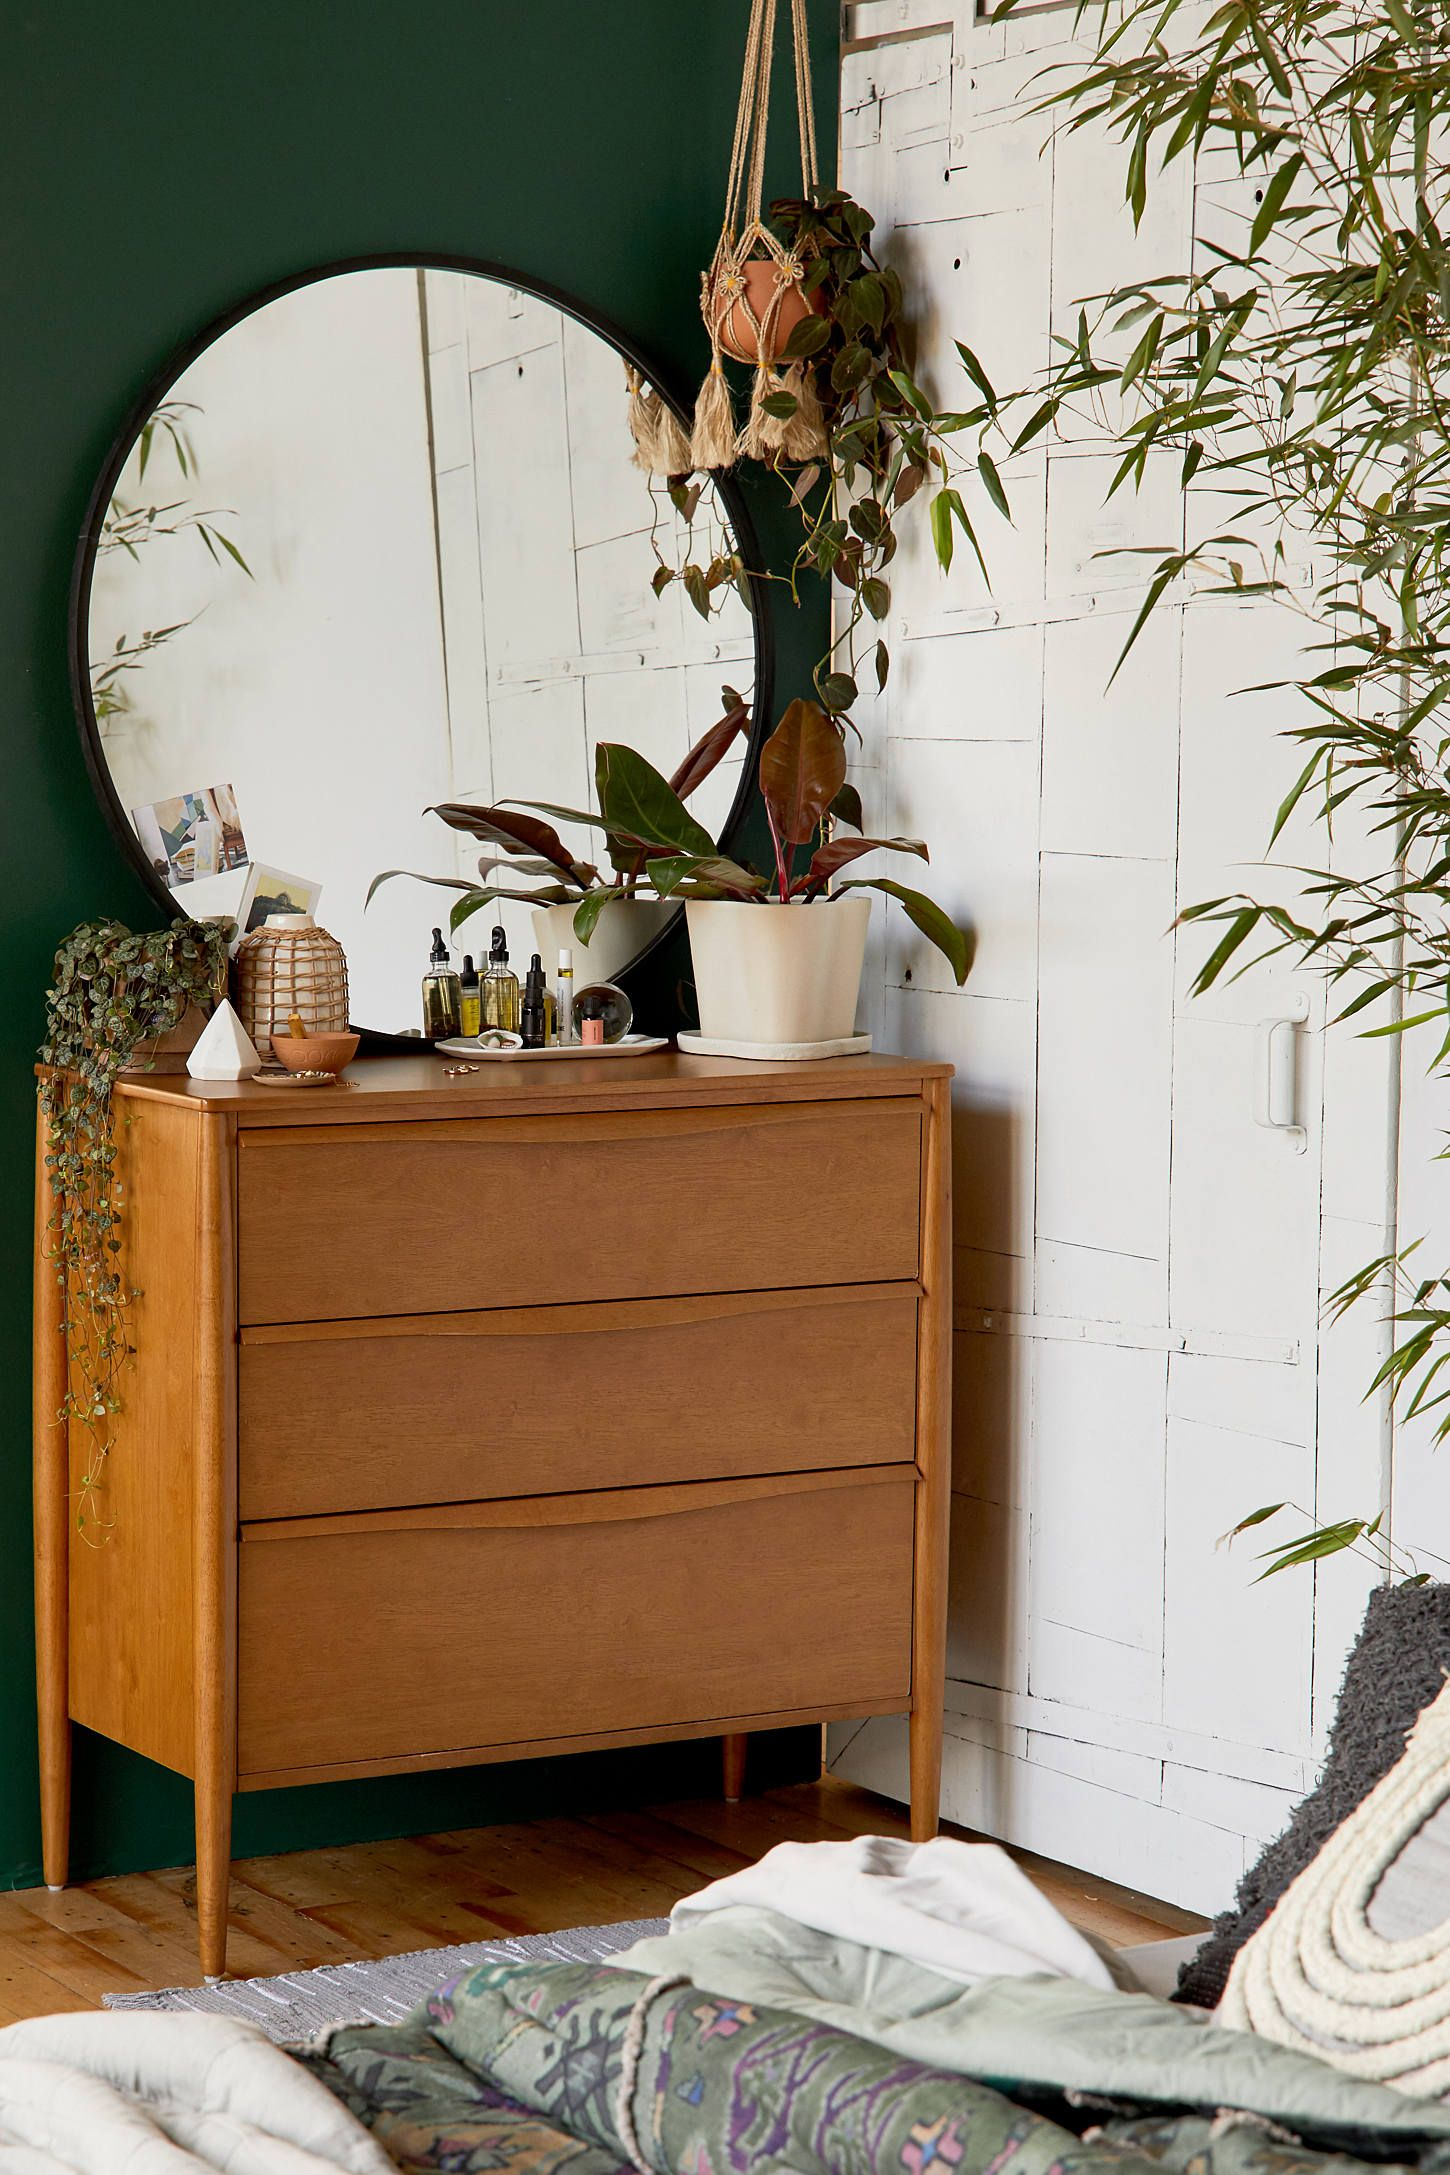 Huxley 3 Drawer Dresser Dresser Decor Home Decor Decor